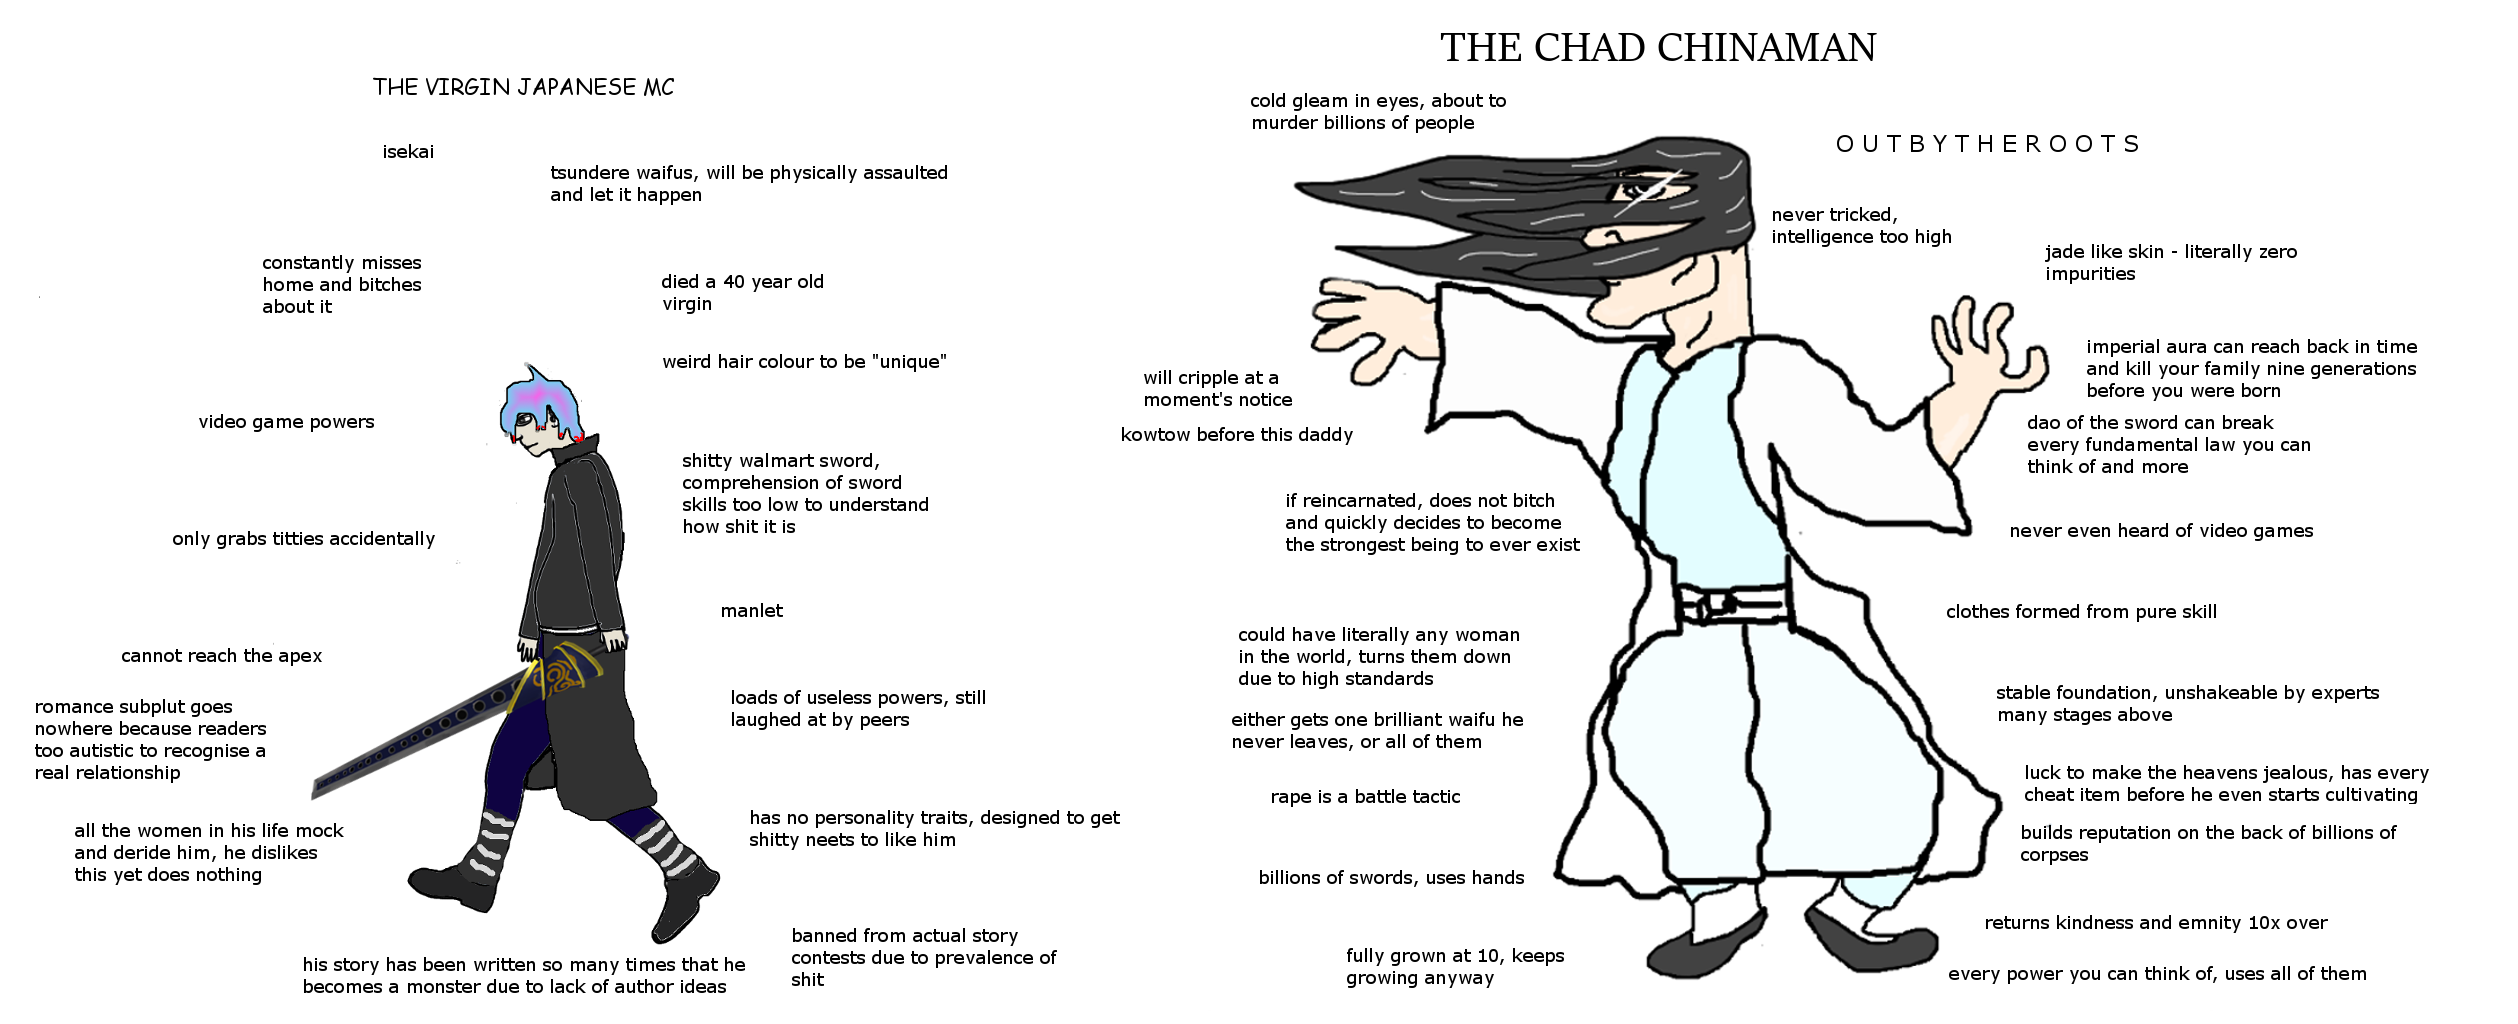 Composite Isekai Protagonist vs Composite Xianxia/Wuxia